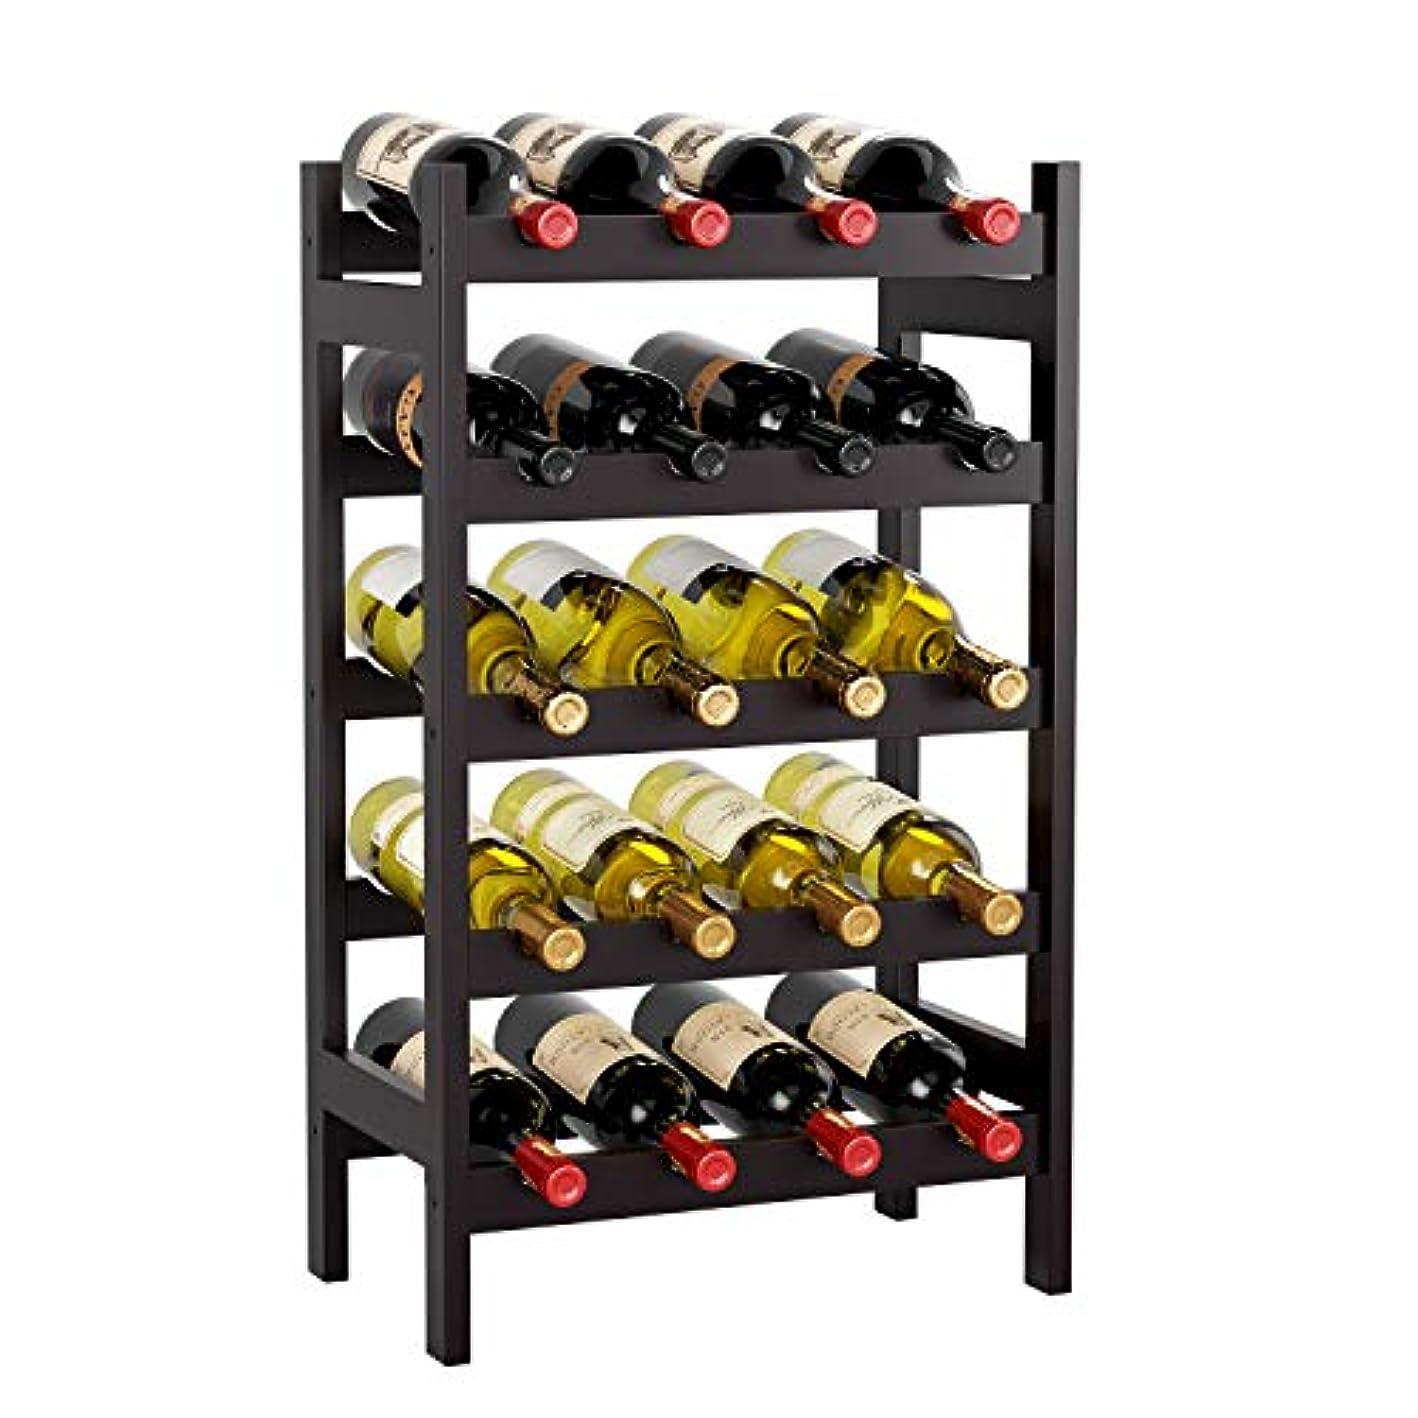 HOMECHO 20 Bamboo Wine Display Bottles Storage Rack Free Standing with 5-Tier Shelf Wobble-Free Retro Color HMC-BA-003